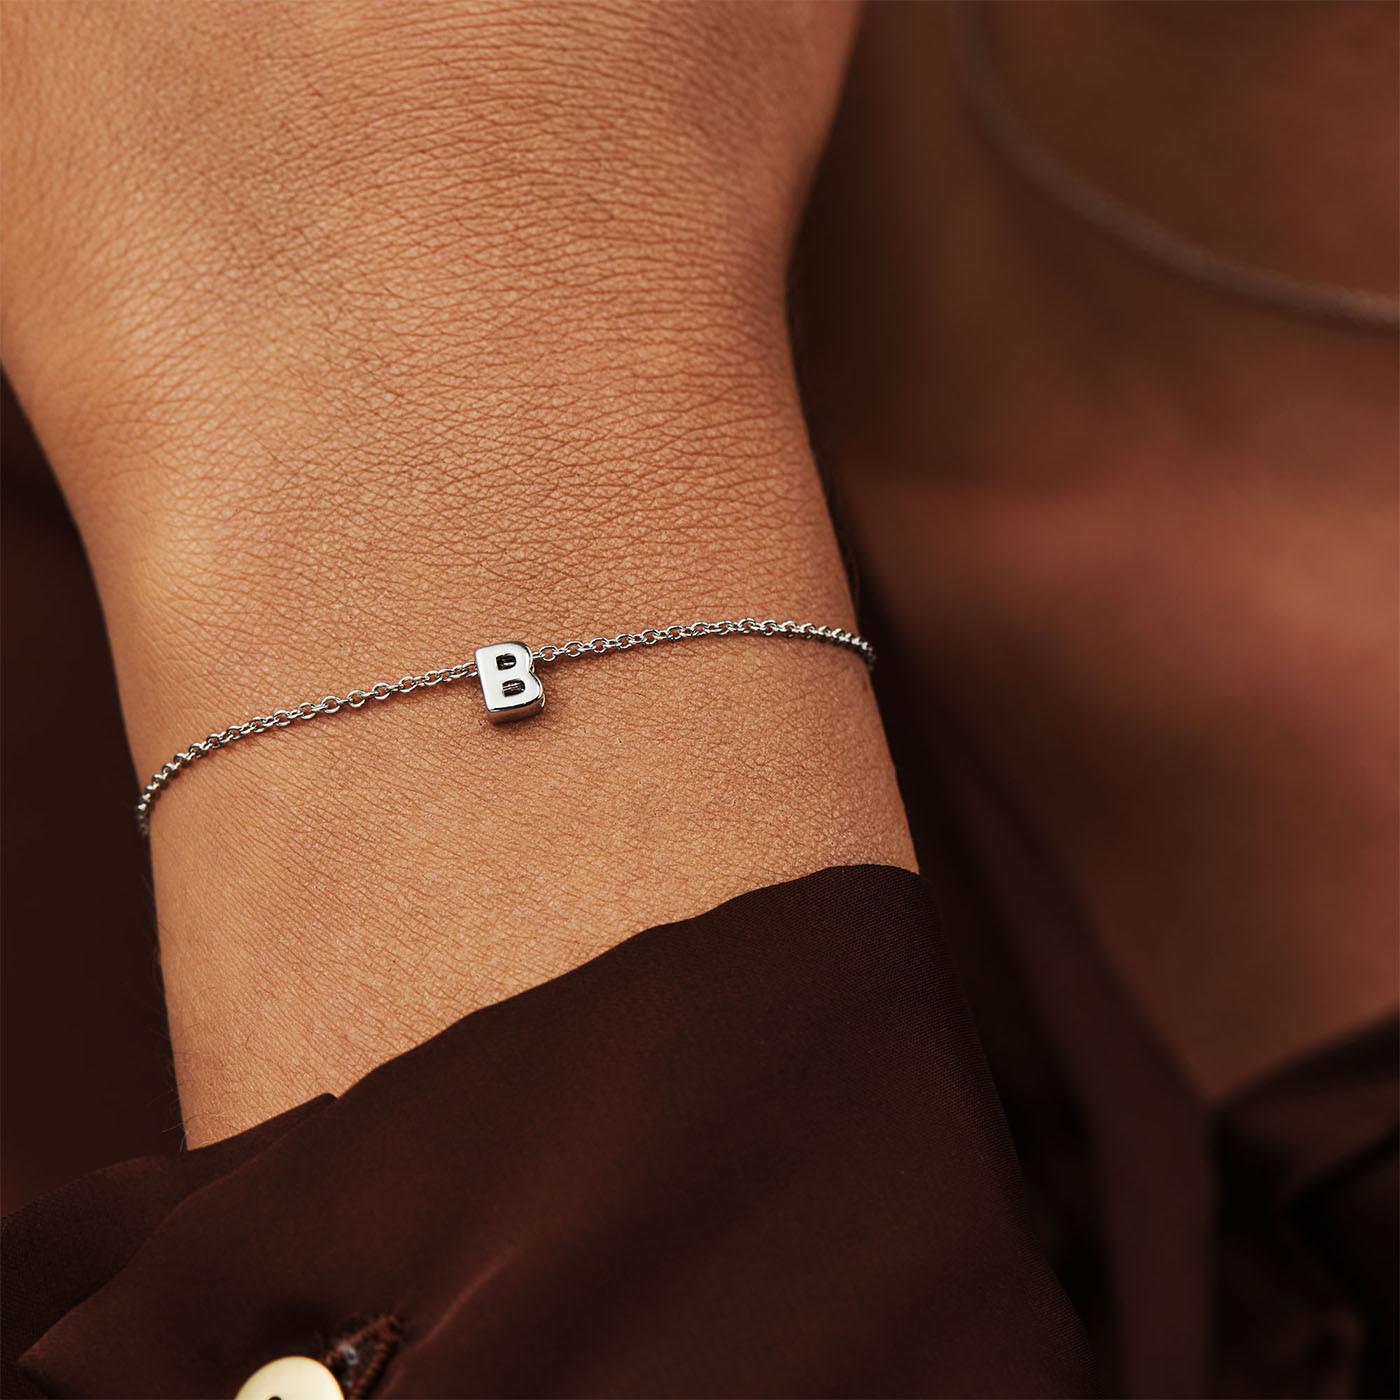 Selected Jewels Julie Chloé 925 sterling zilveren initial armband SJ320009